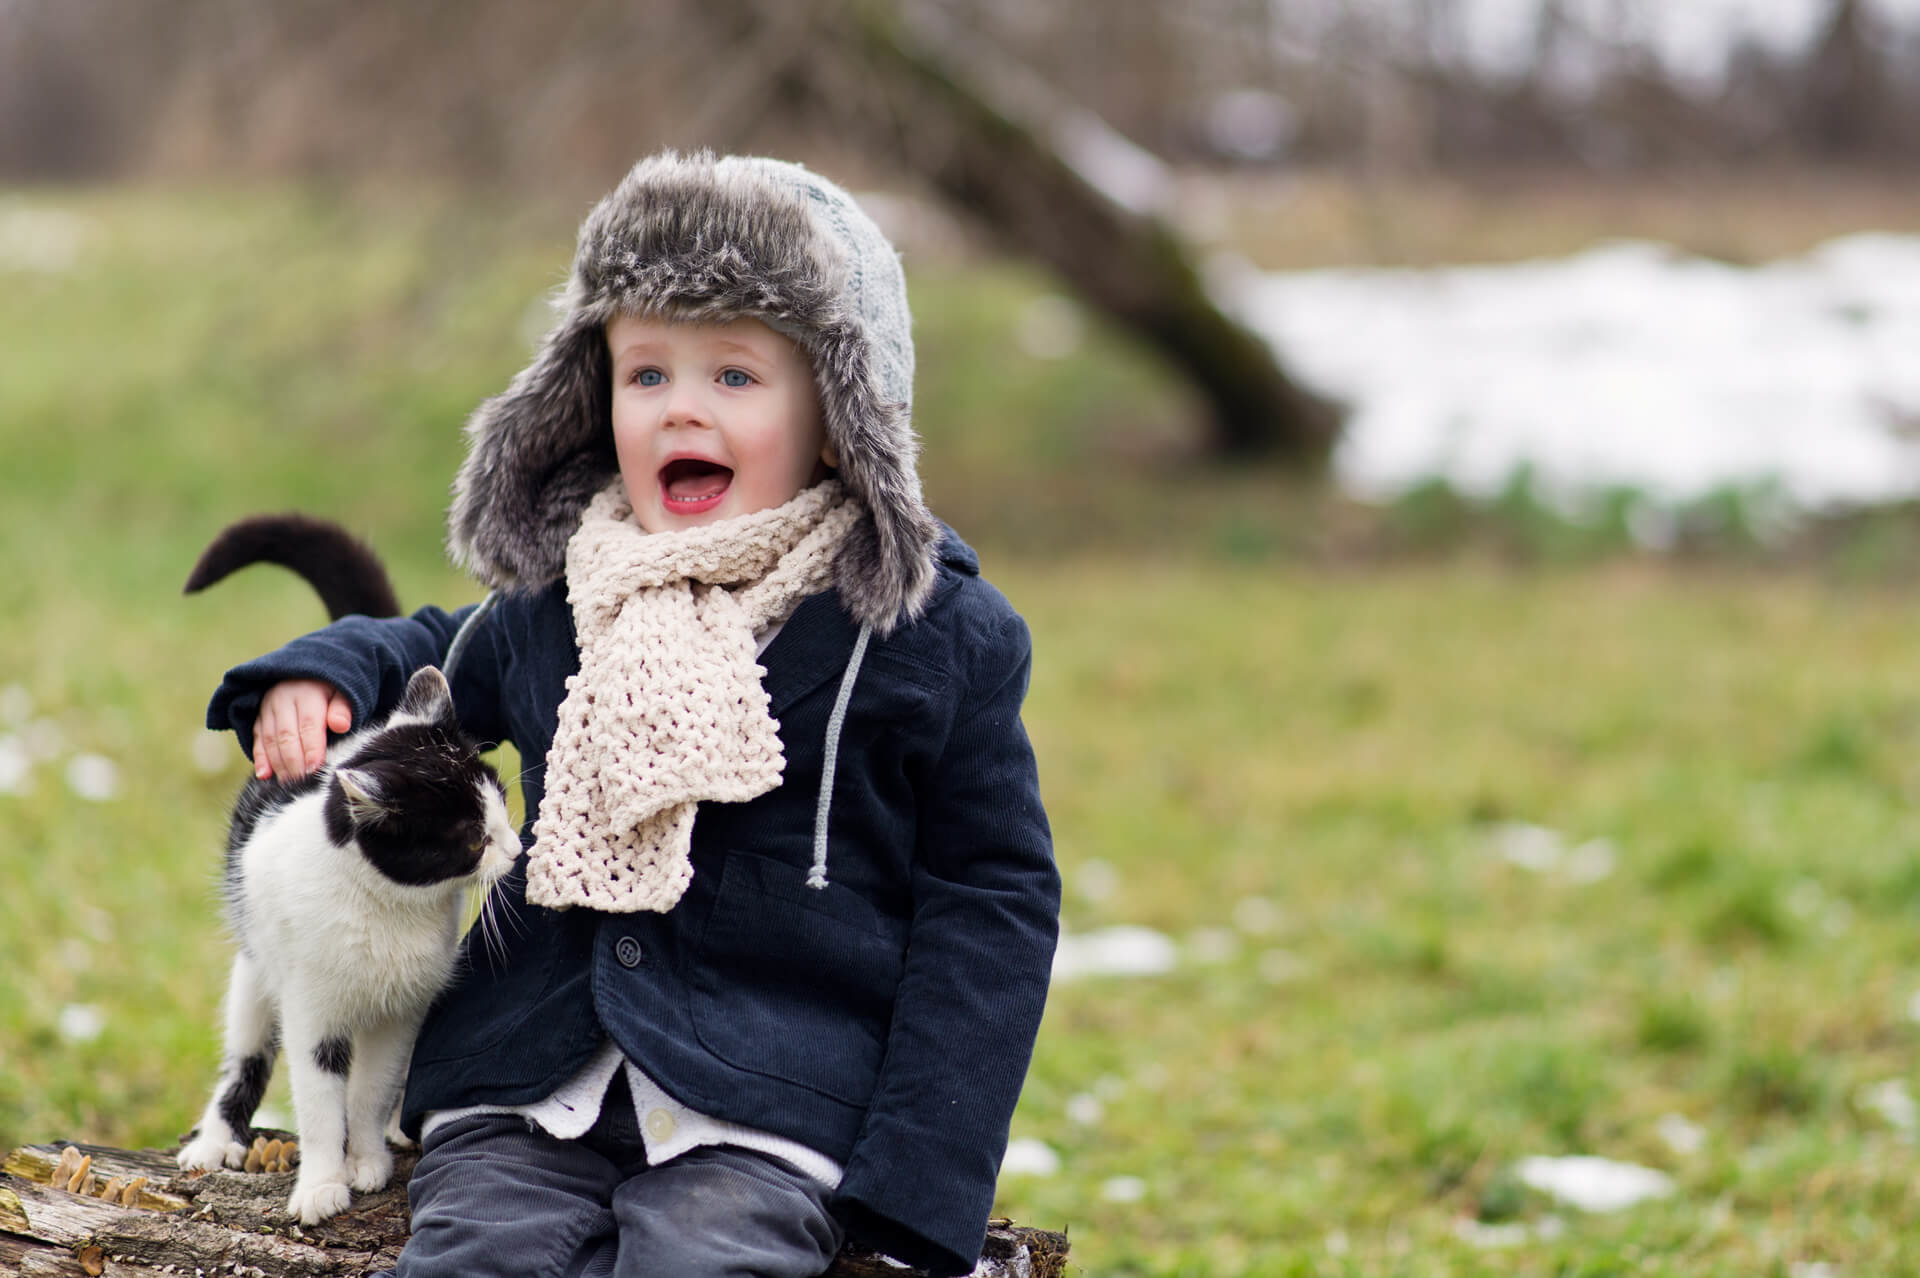 profesionalny fotograf Peter Norulak Kosice umelecke fotky deti exterier priroda jesen_13